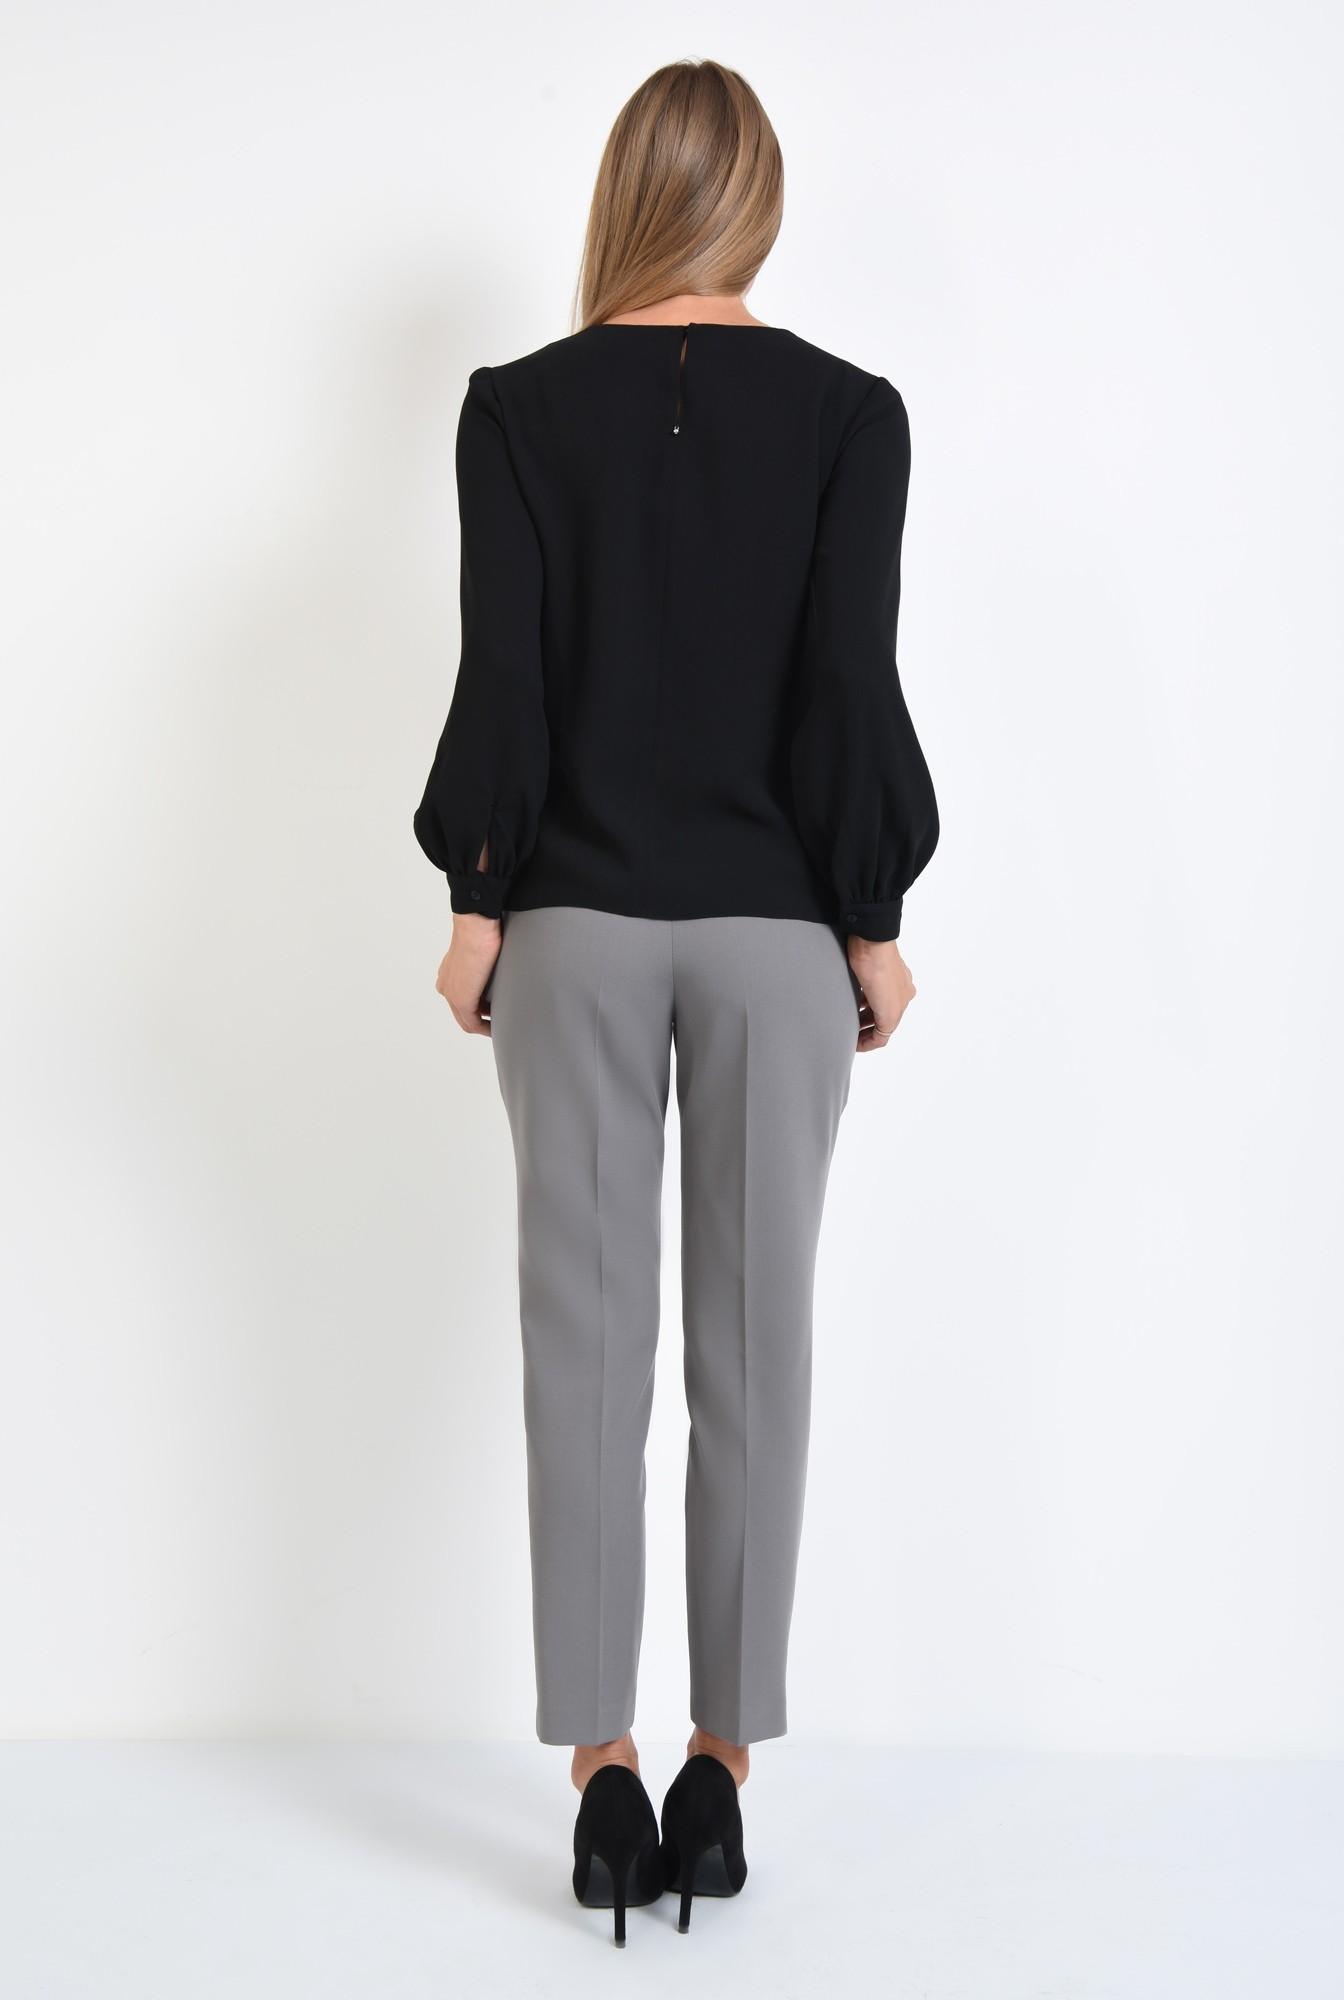 1 - 360 - bluza casual neagra, maneci cu mansete, tesatura fluida